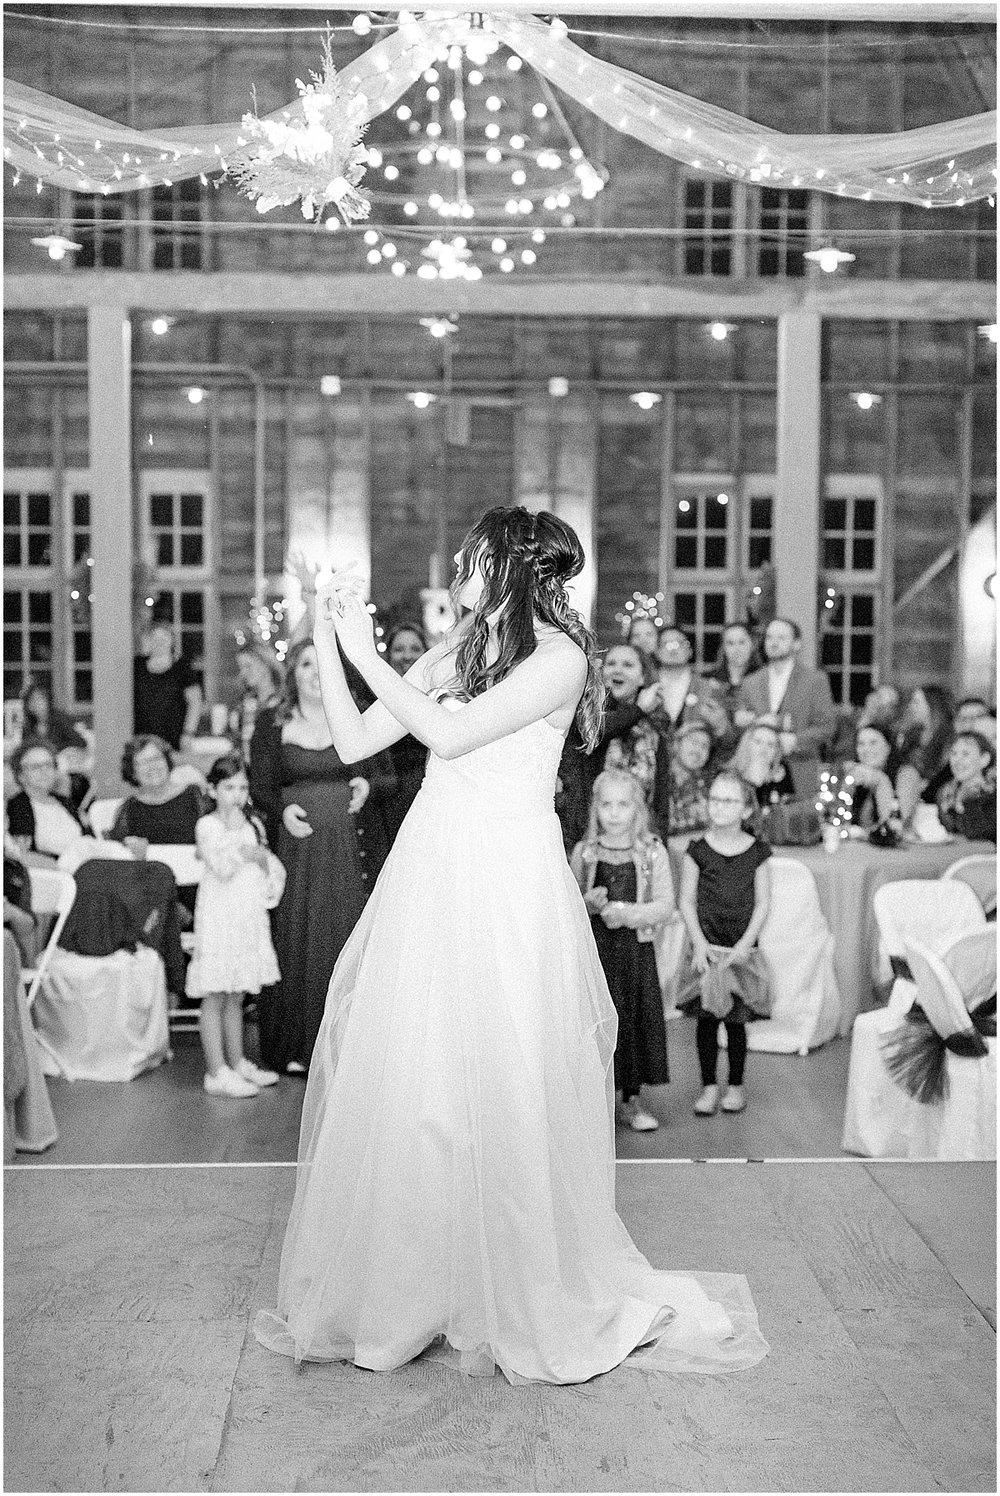 Chehalis Washington Winter Wedding Silver and White | Willapa Hills Farm Wedding | Eastham | Emma Rose Company PNW Light and Airy Wedding Photographer_0055.jpg